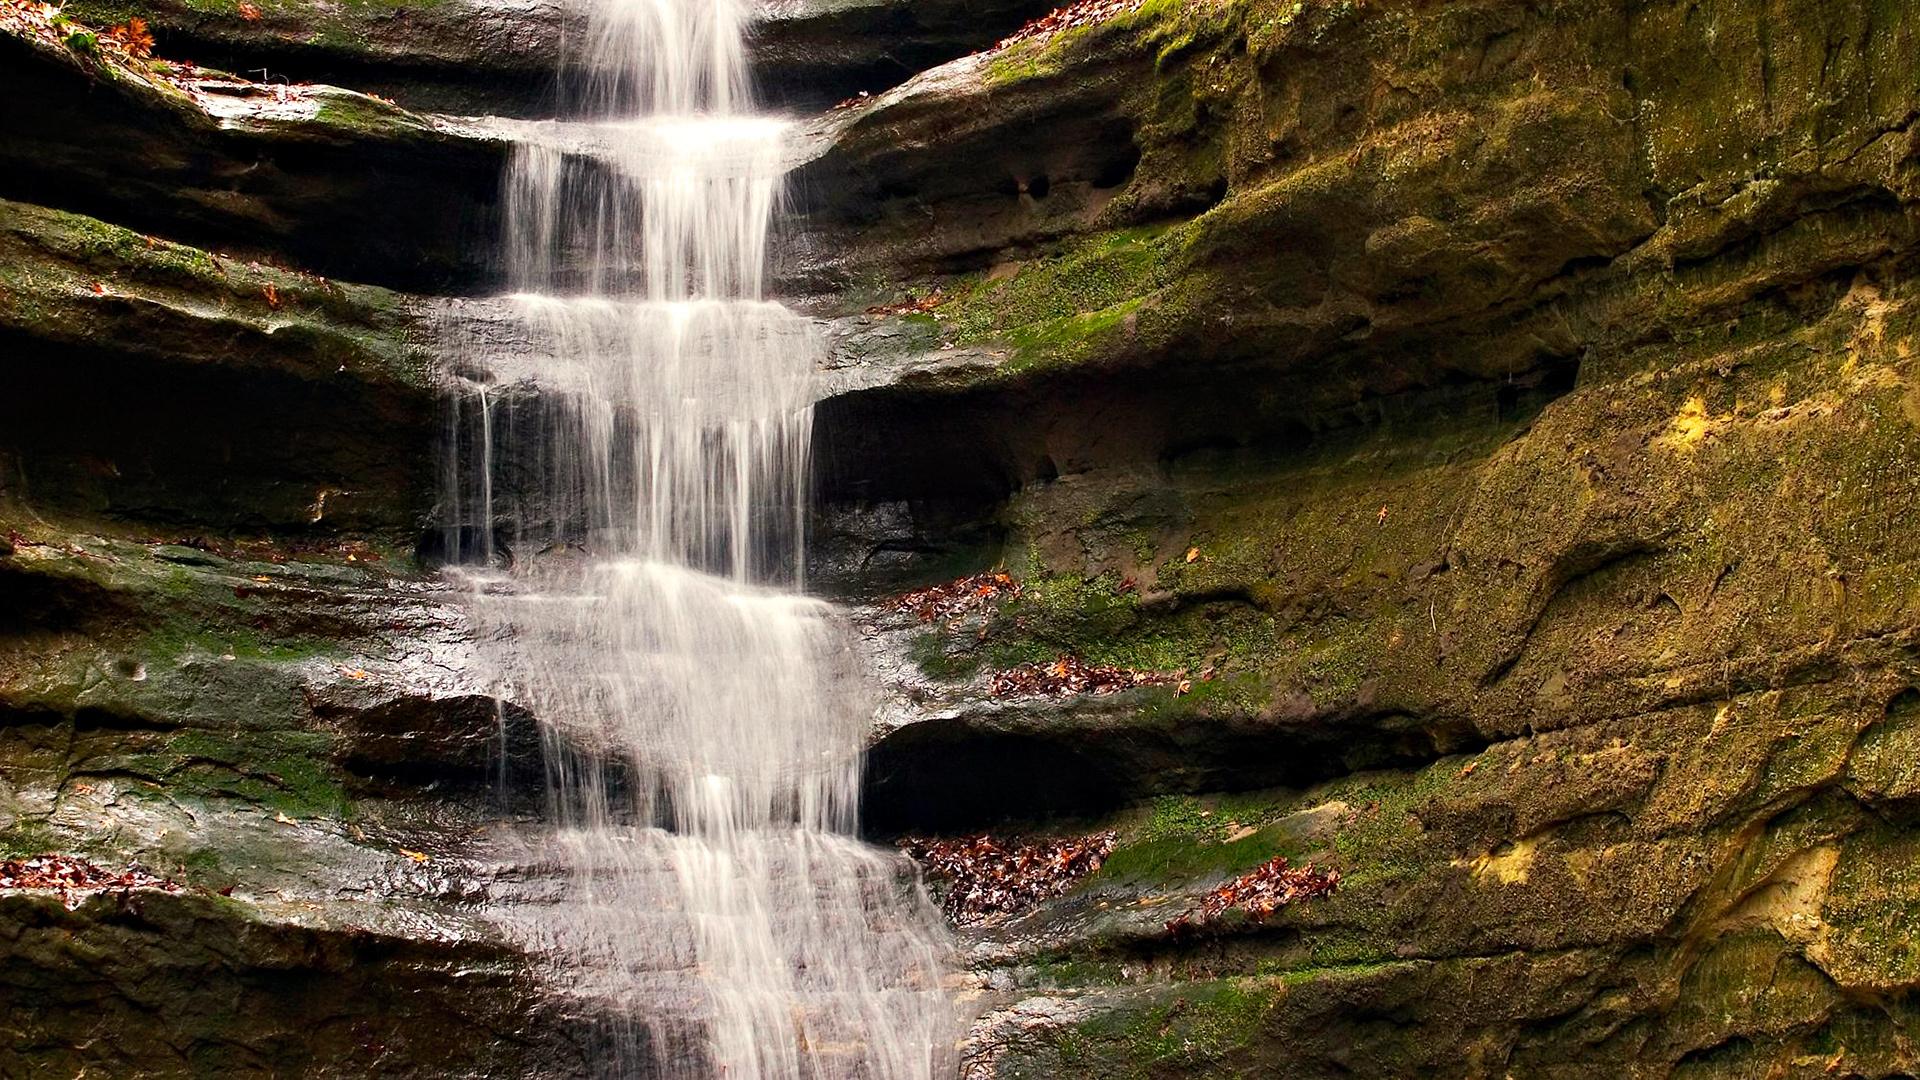 водопад мох плиты воронка онлайн